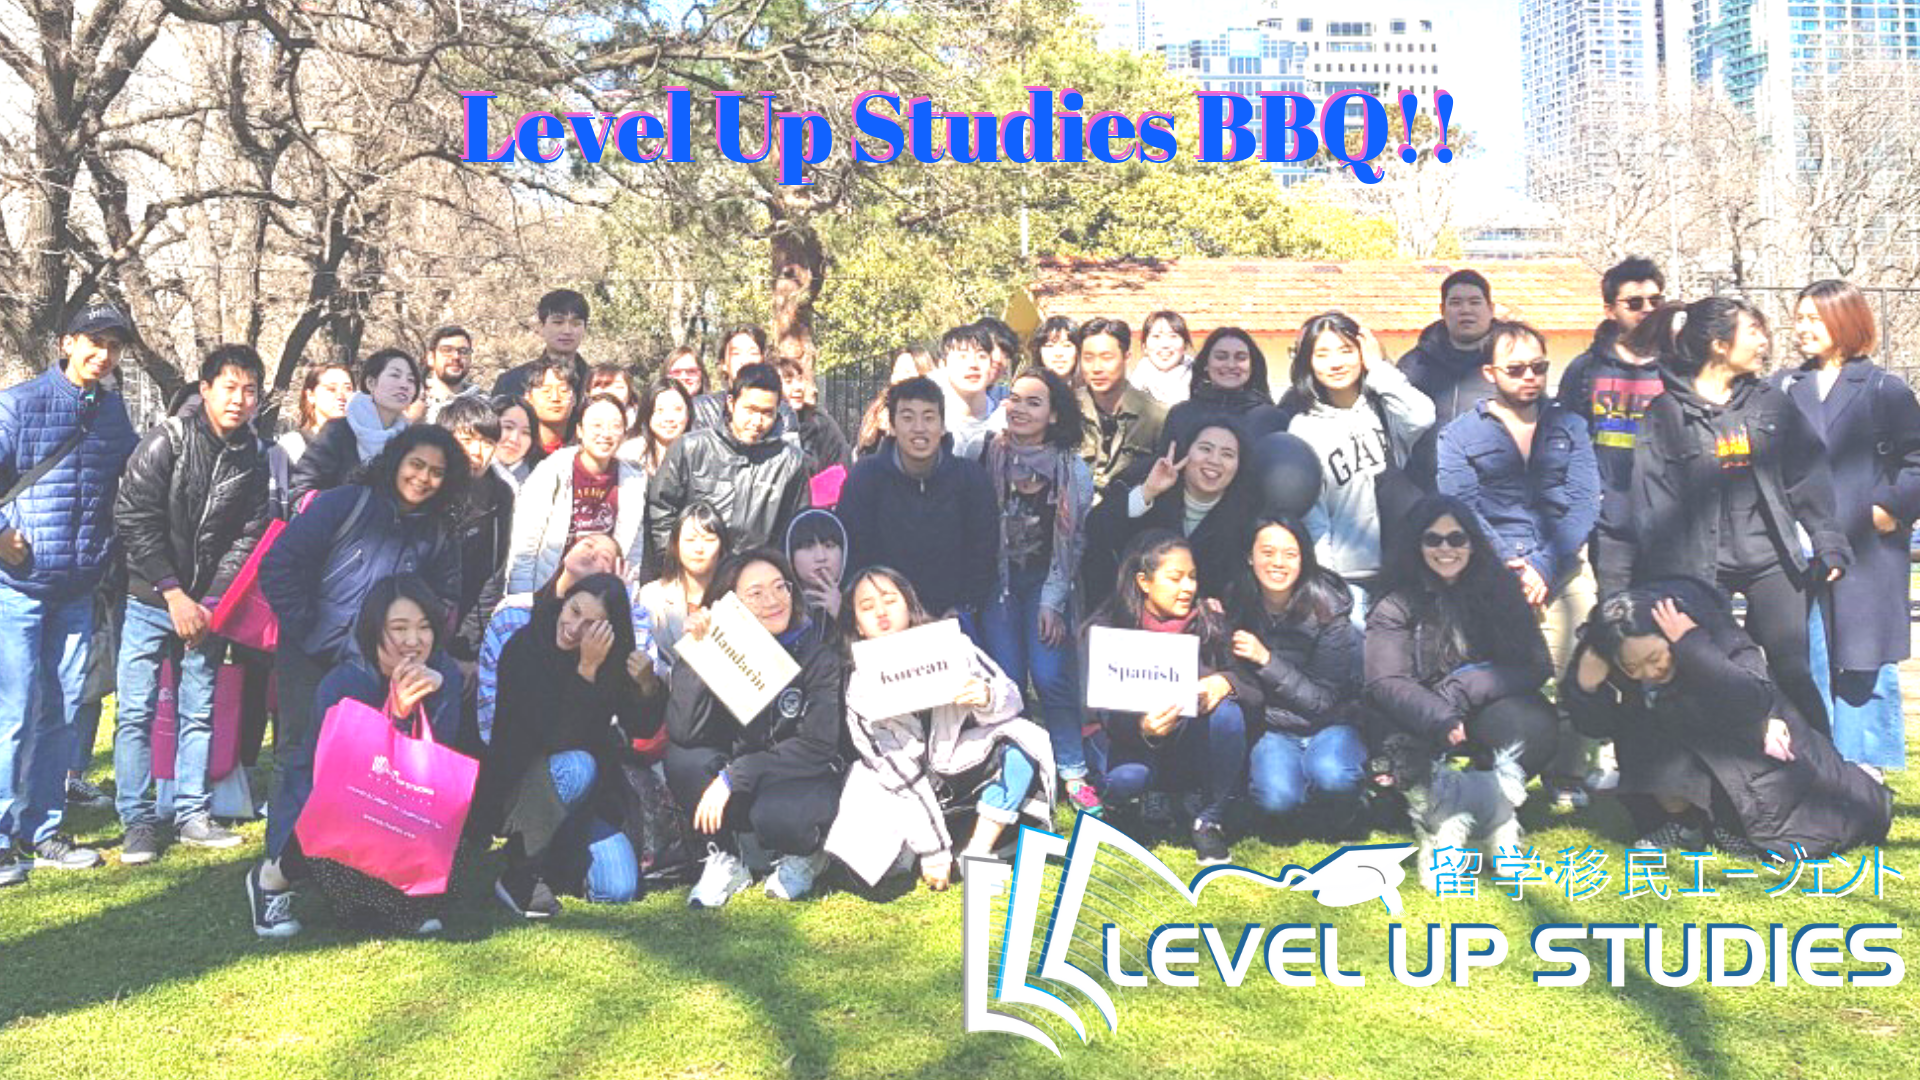 Level Up Studies BBQ!! (2)